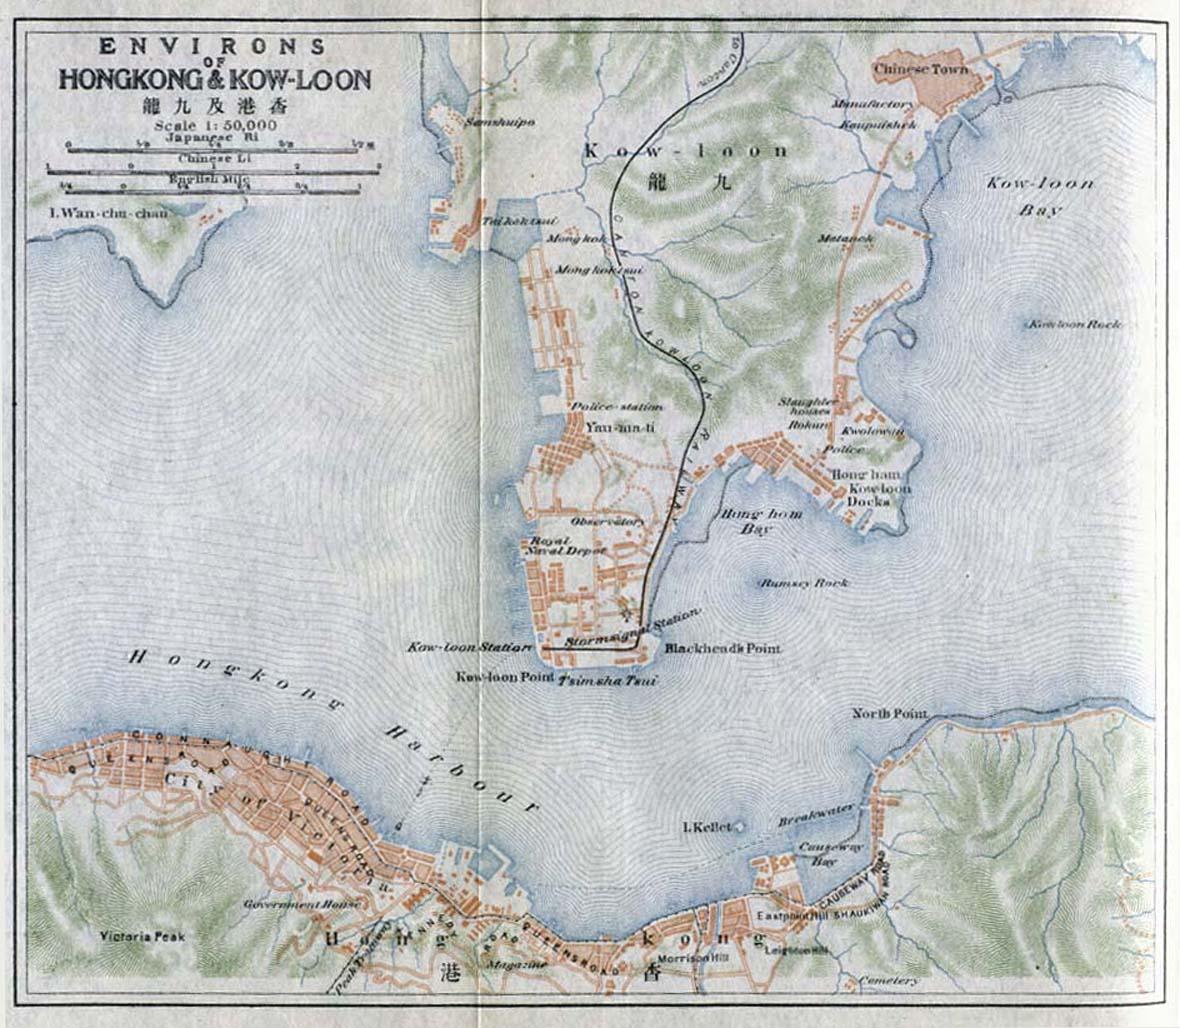 Hong Kong: Big Blue 1840-1940: Hong Kong